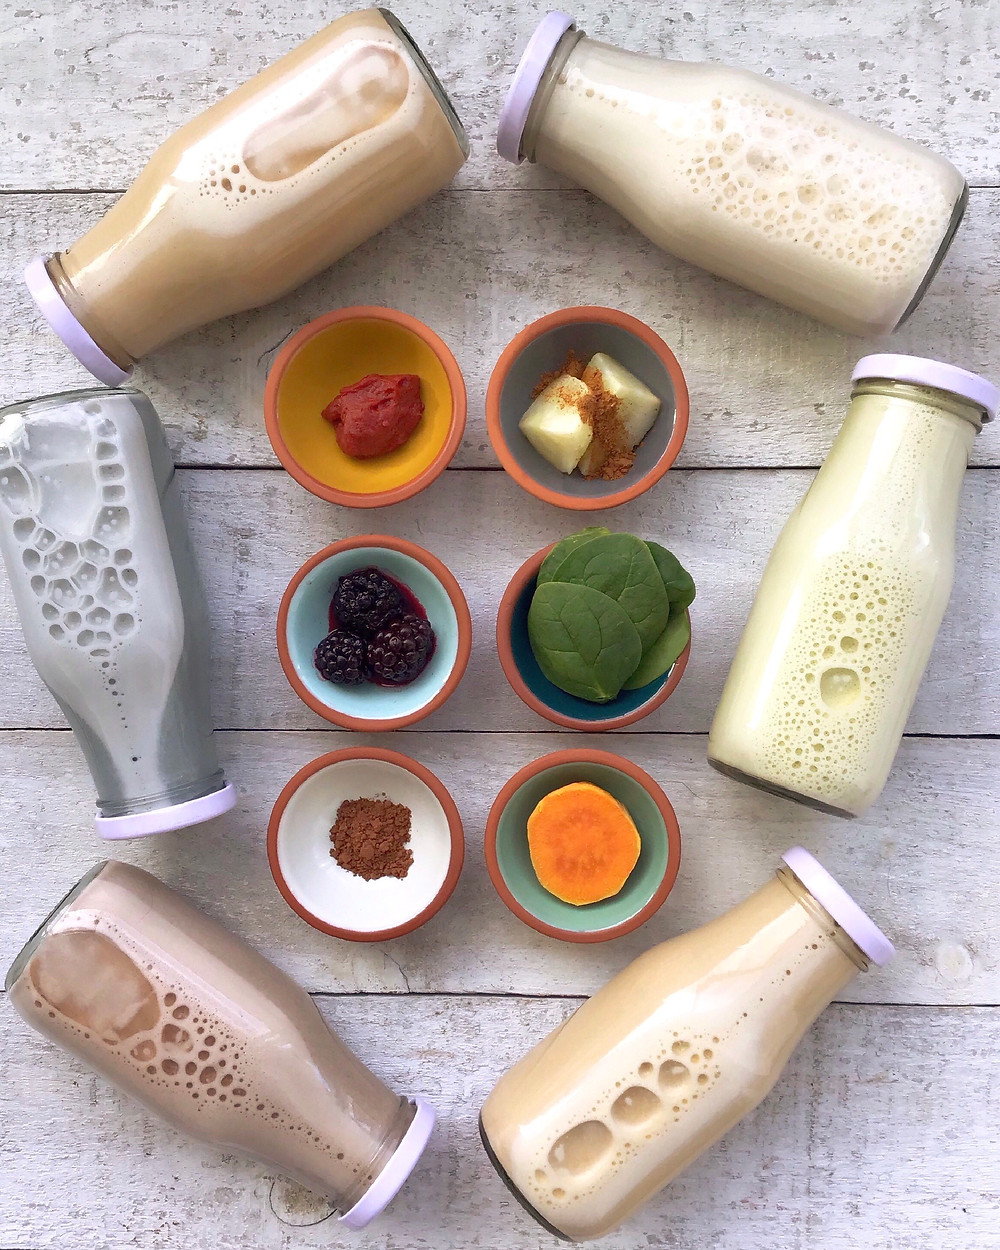 blended food with tube feeding formula